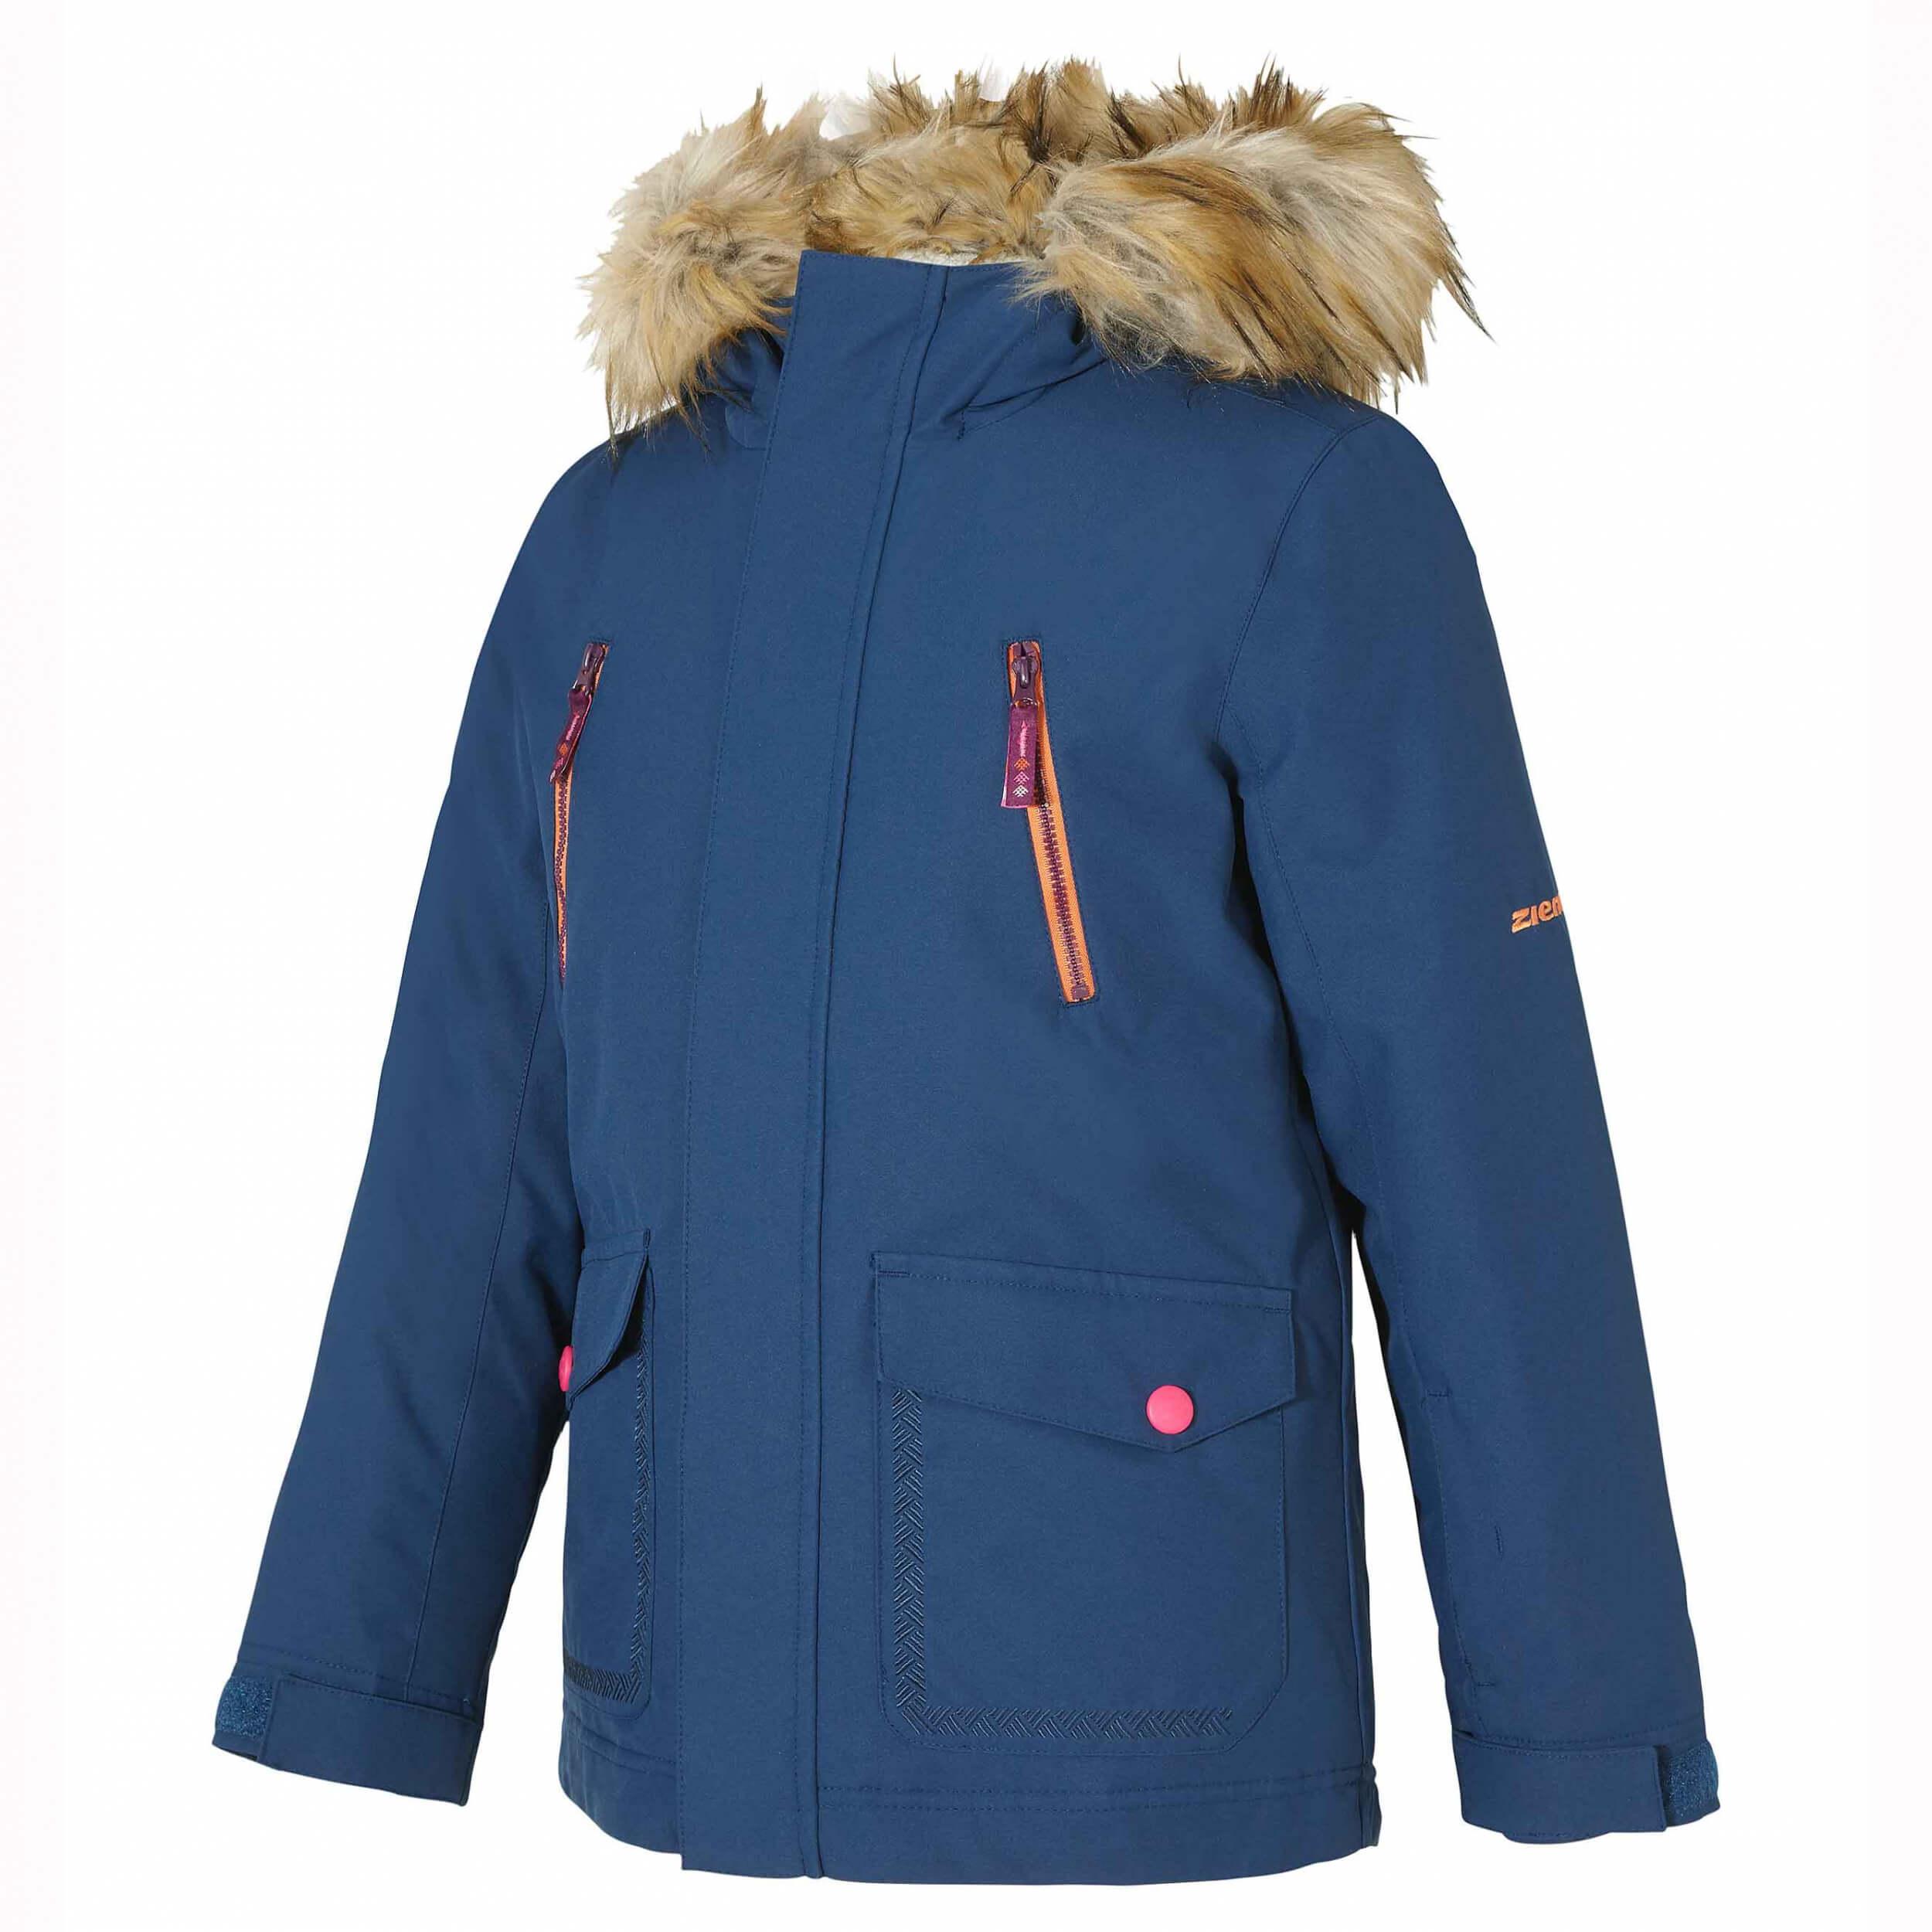 ZIENER Kinder Skijacke Abudo blau 143861